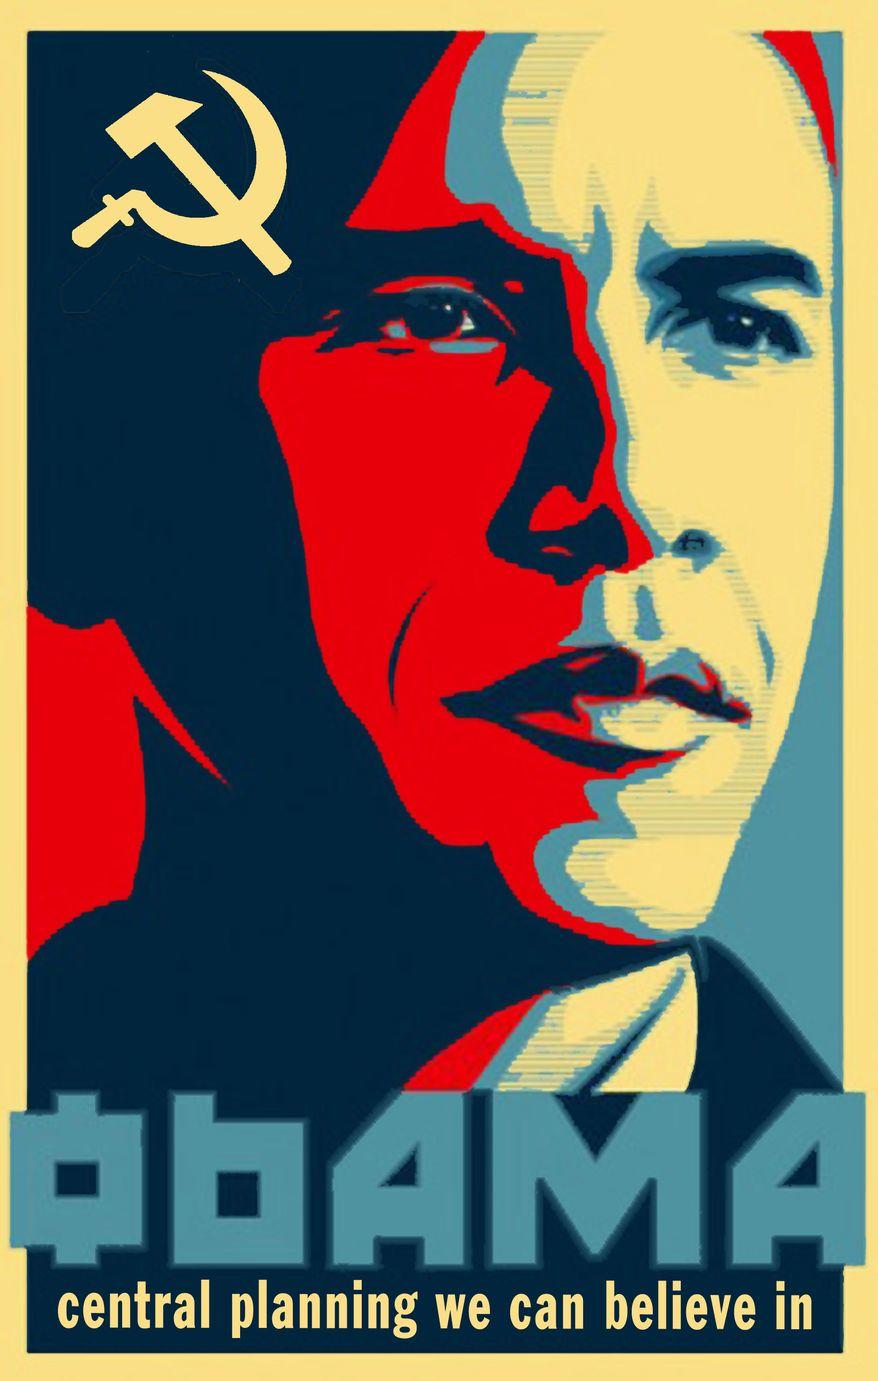 Illustration Obamaphobia by John Camejo for The Washington Times